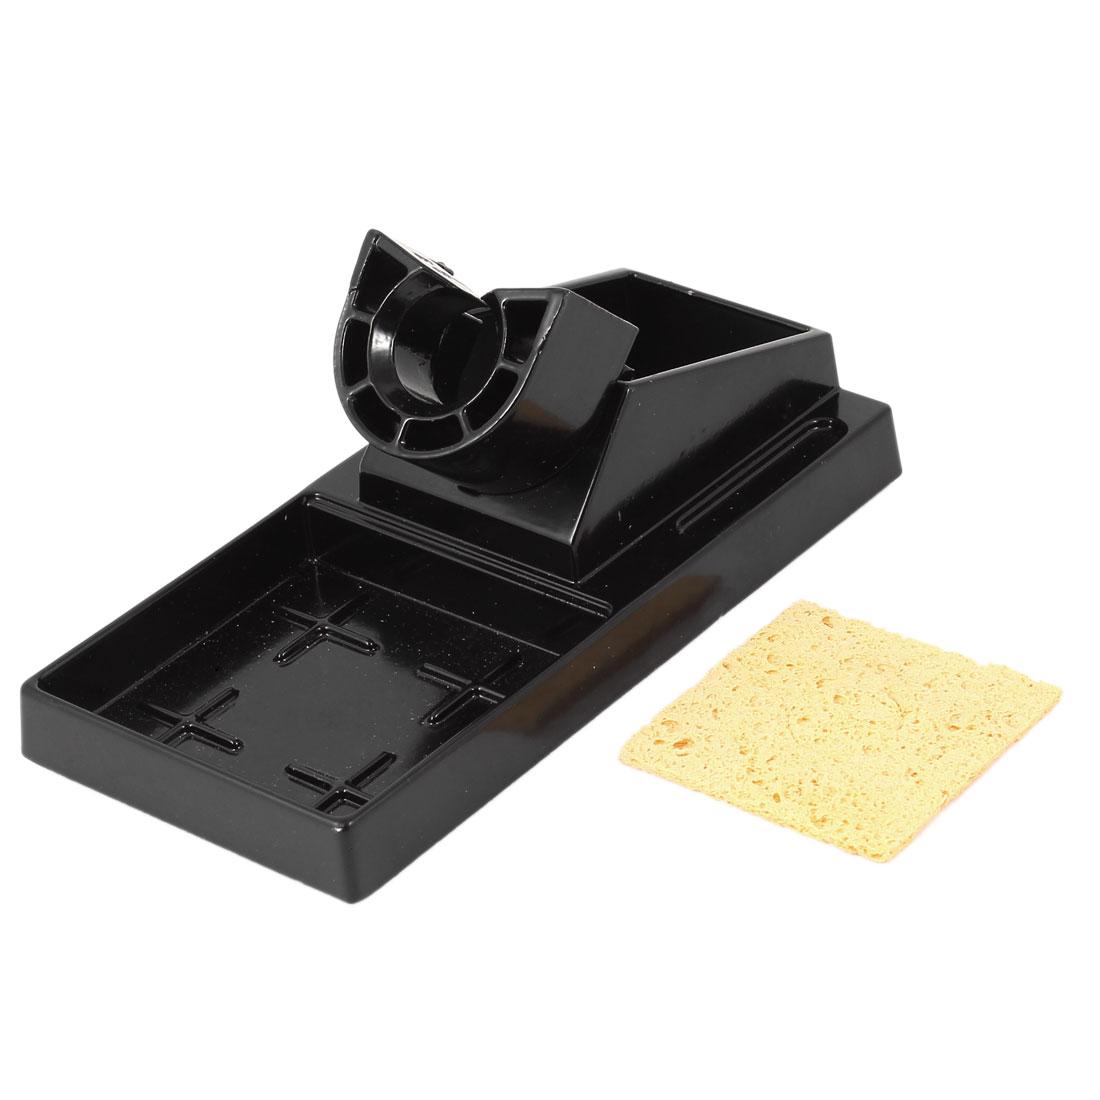 Black Aluminium 16.1 x 8cm Benchtop Base Stand Holder for Soldering Iron